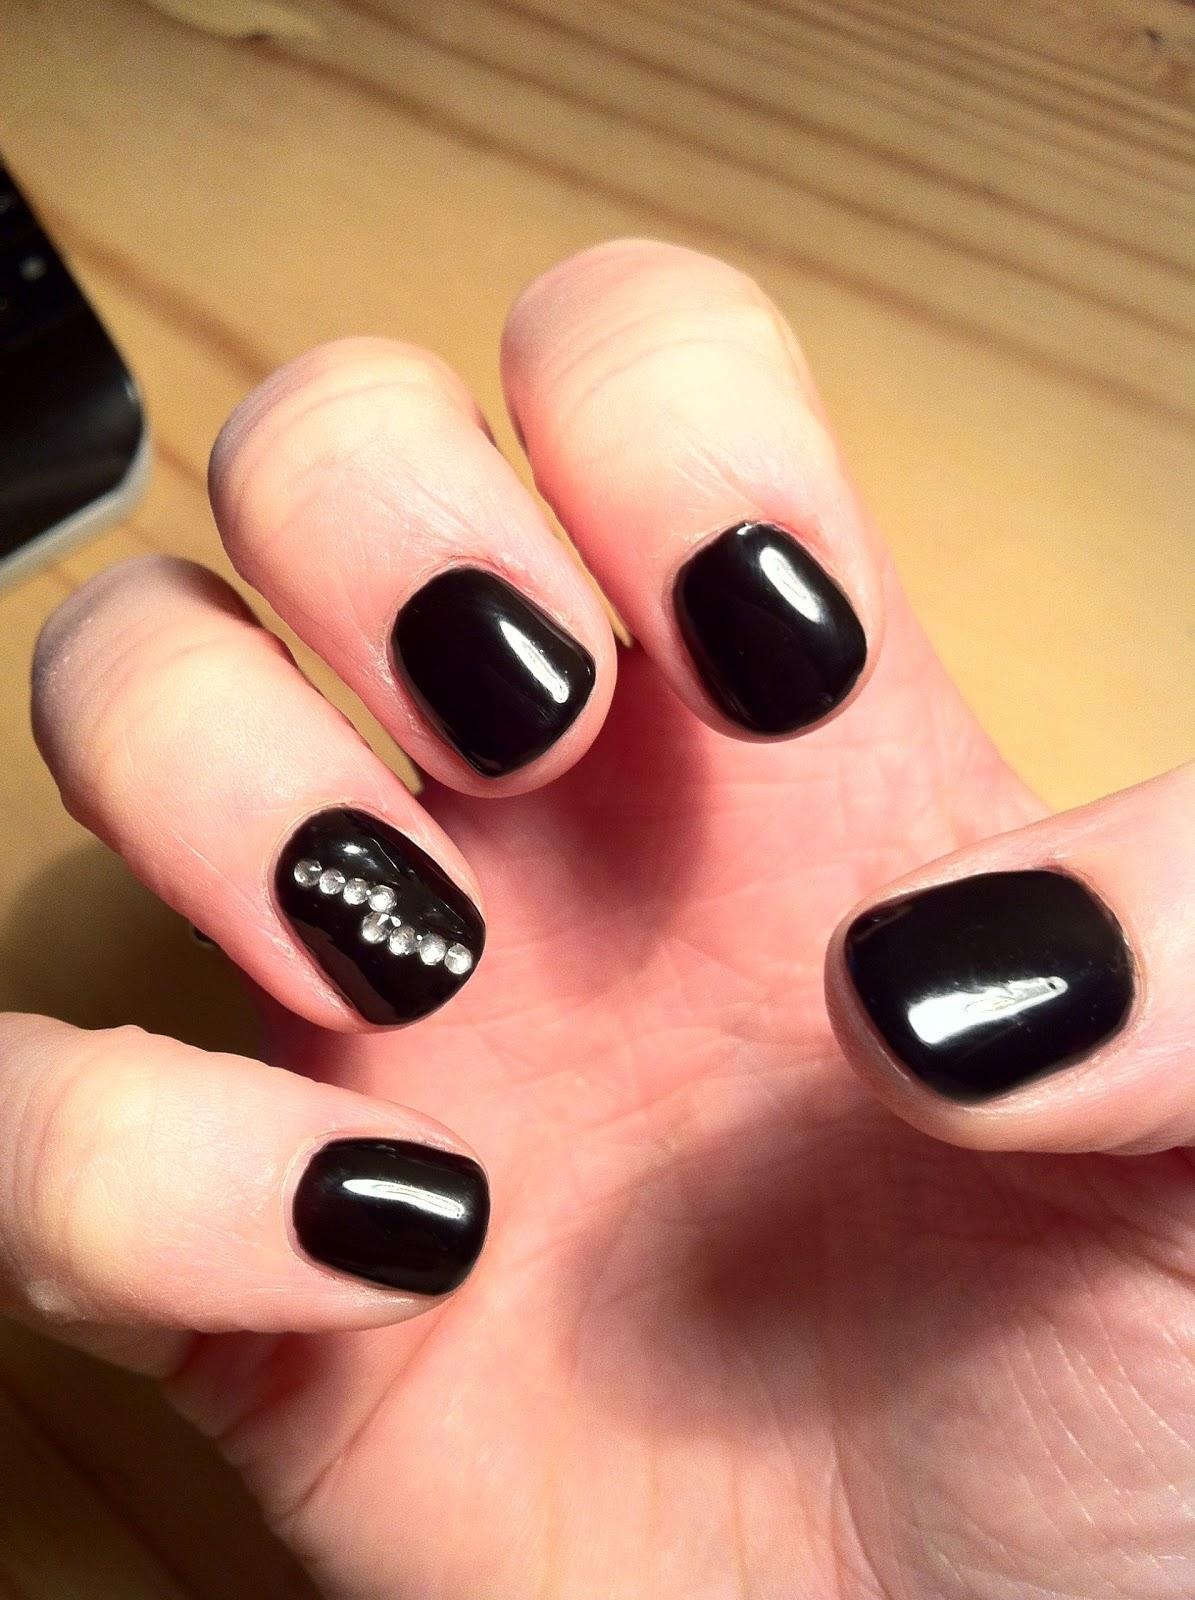 Brush up and Polish up!: CND Shellac Blackpool and Diamanté Nail Art